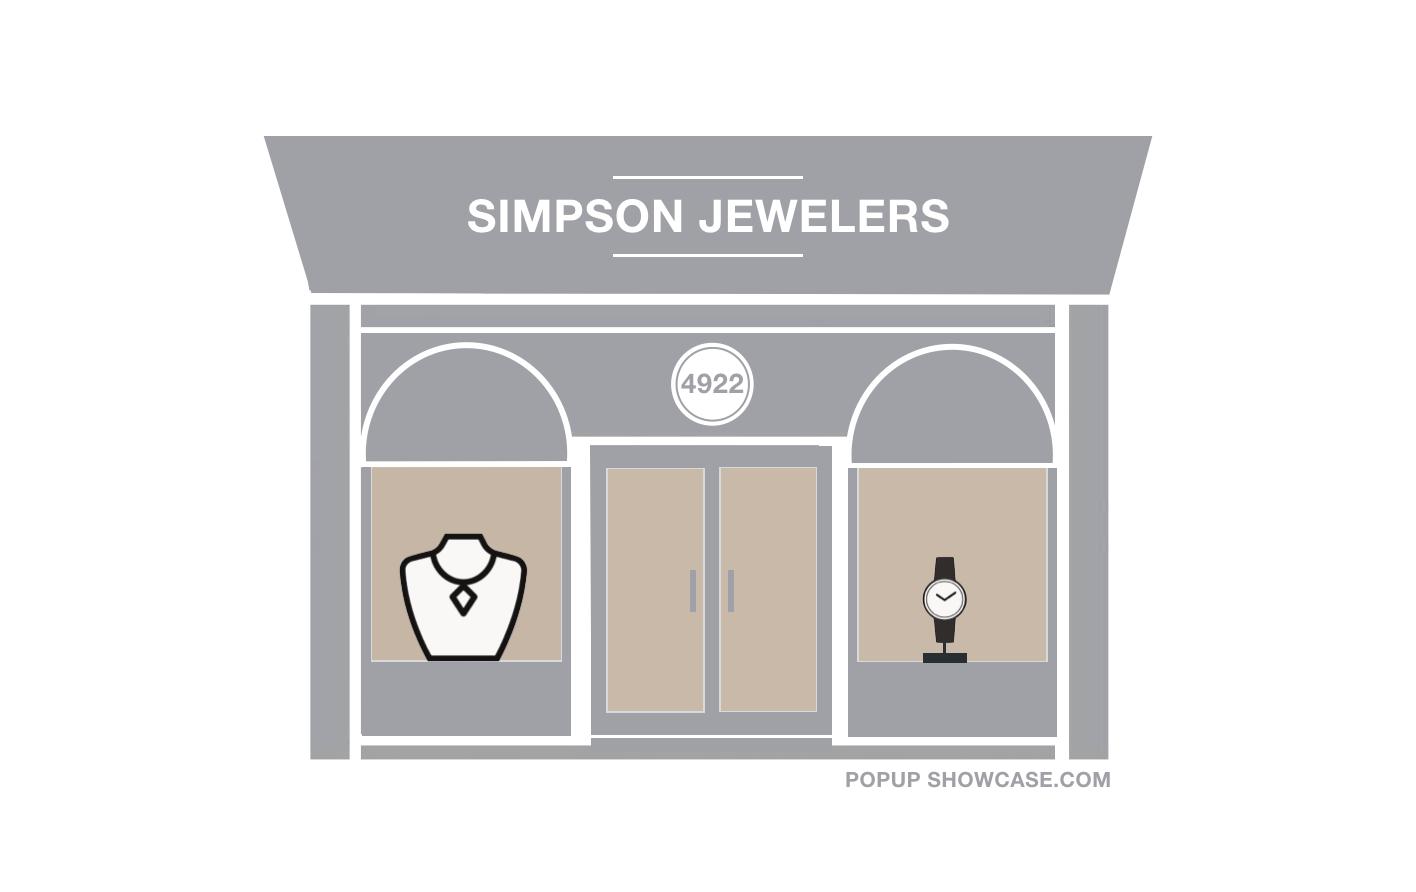 SIMPSON JEWELERS